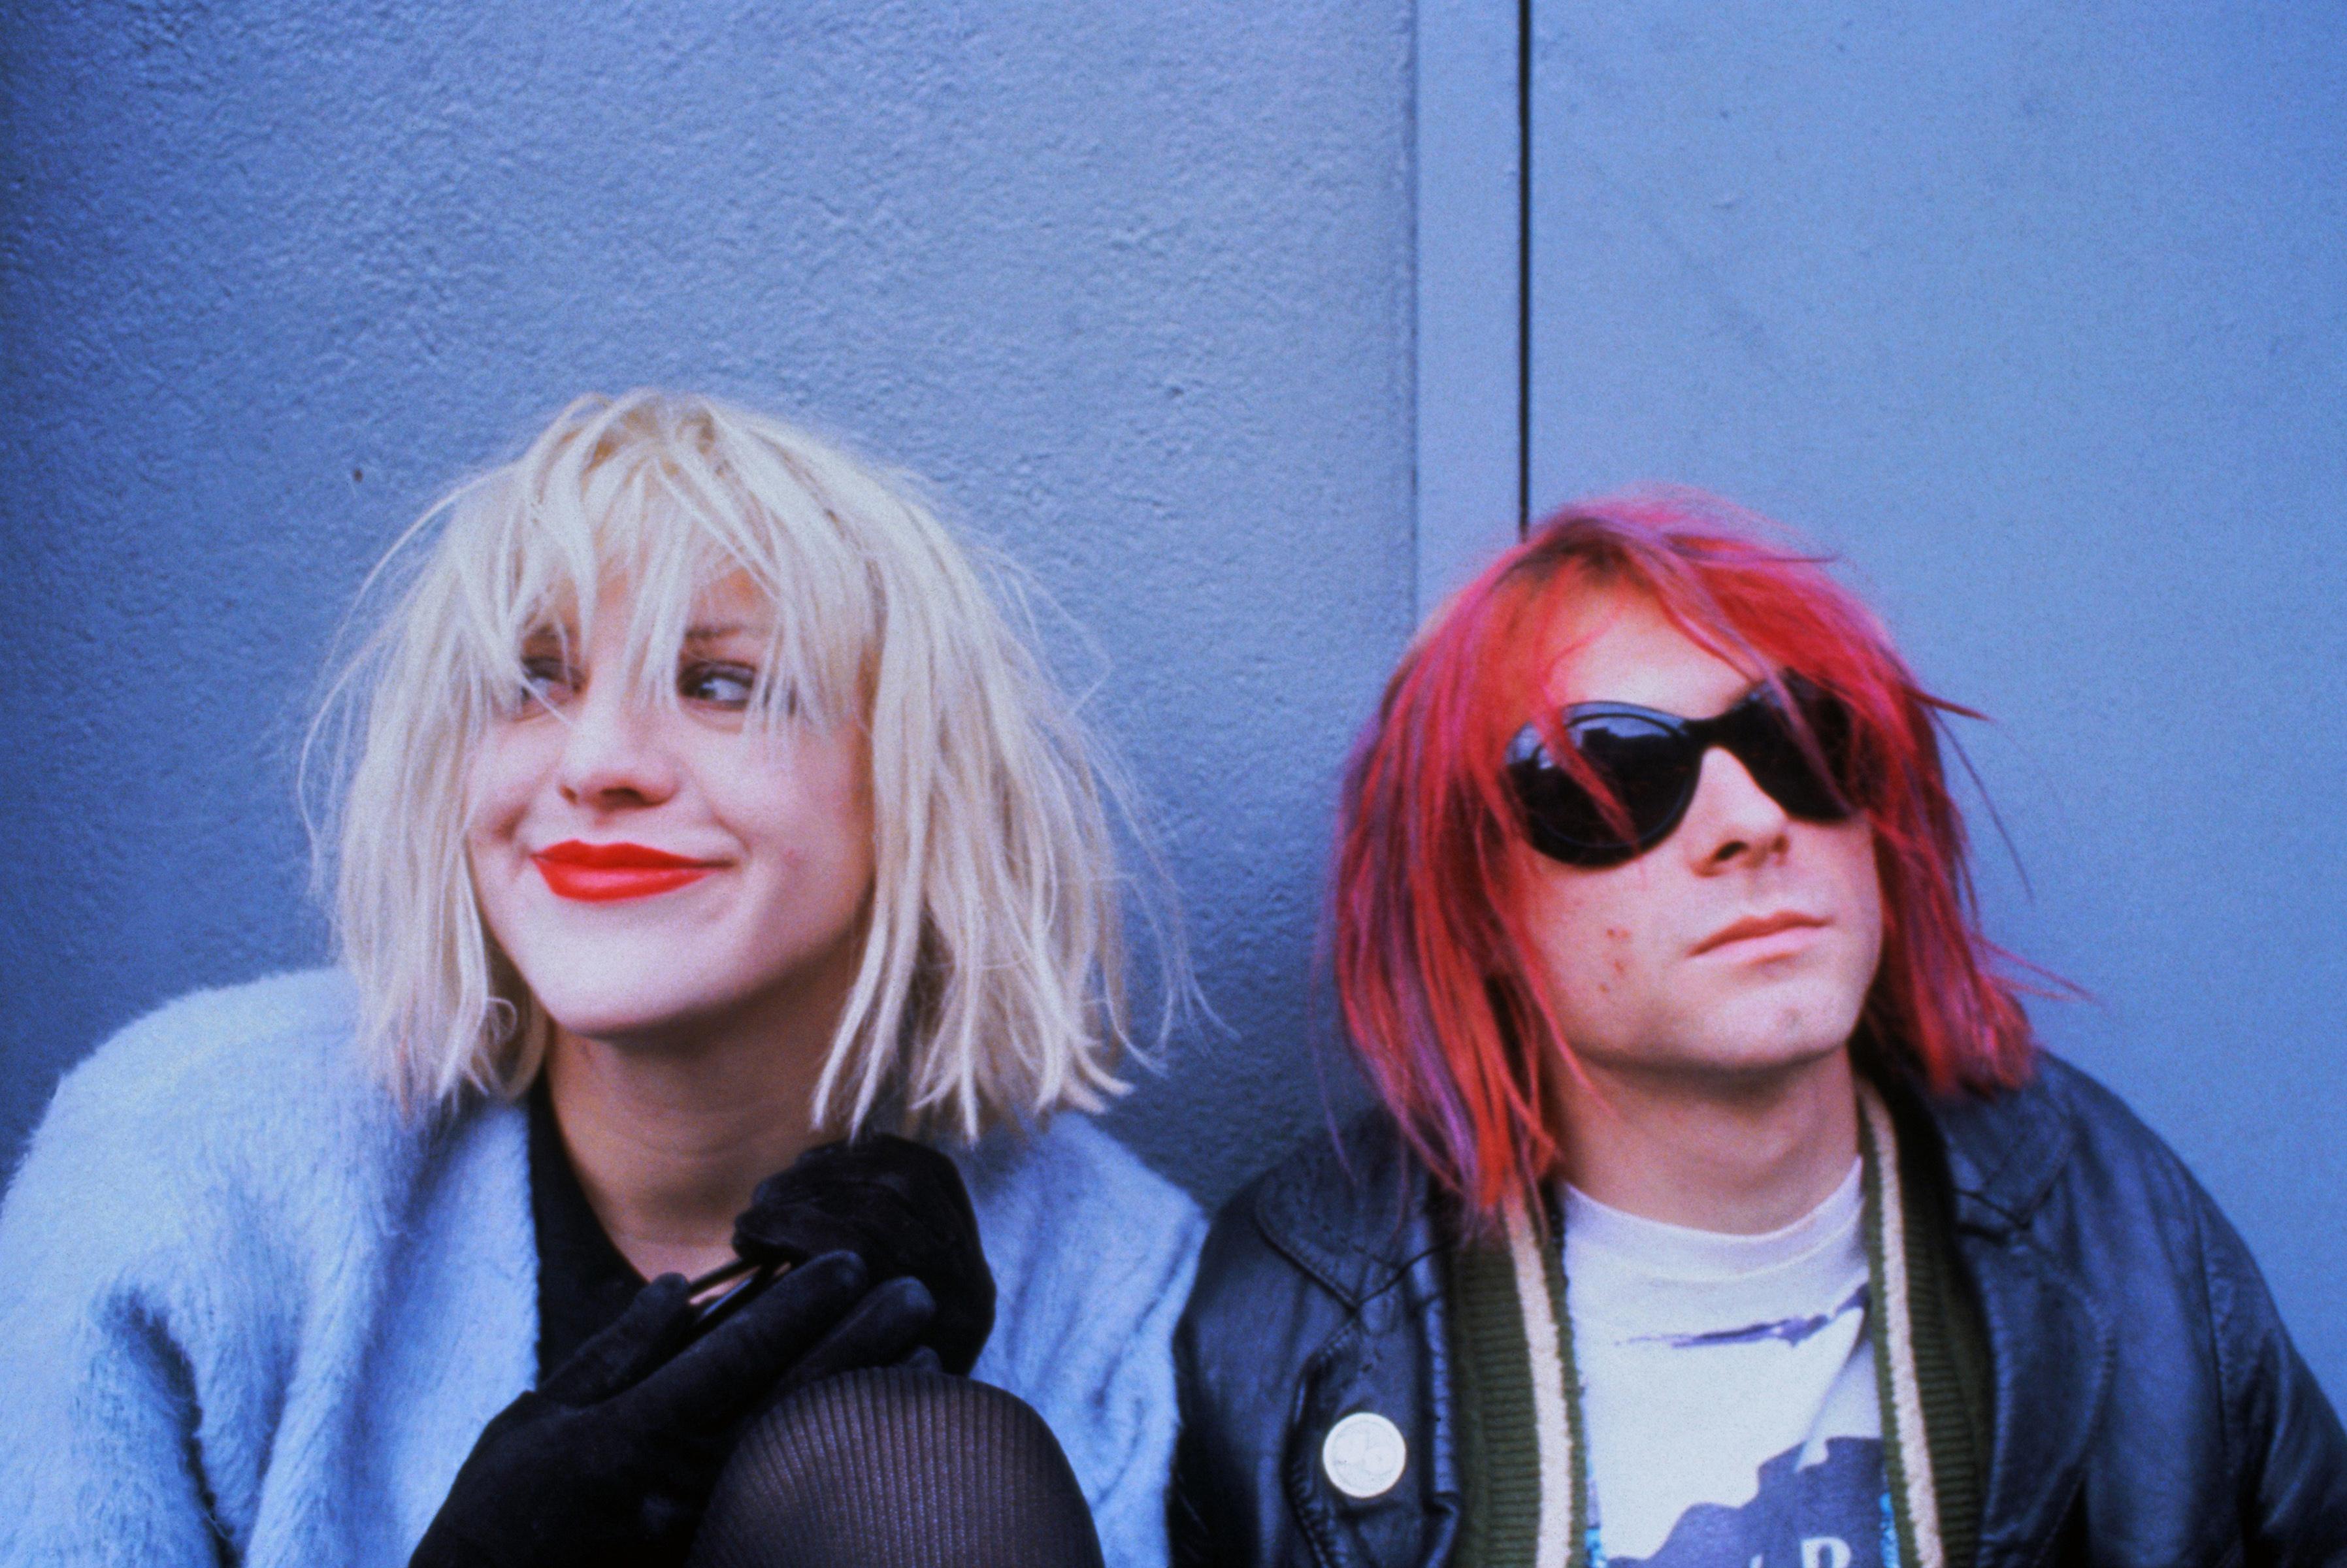 d889d6aa543e Read Courtney Love's Heartfelt Christmas Letter to Kurt Cobain ...